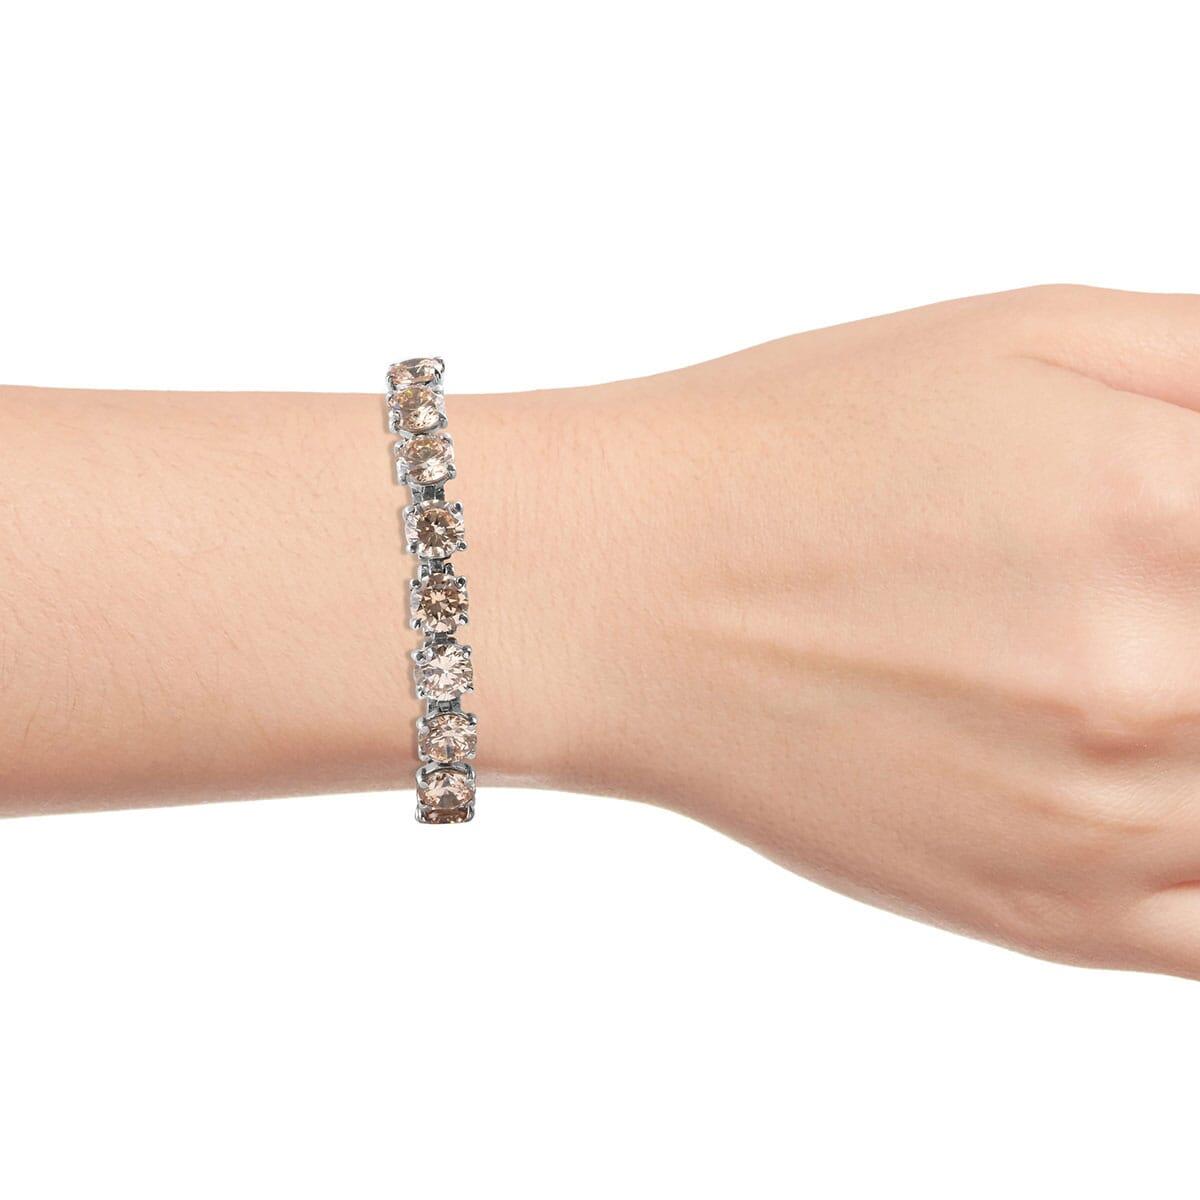 Steel-Cubic-Zirconia-CZ-Orange-Elegant-Adjustable-Bolo-Bracelet-for-Women-Ct-21 thumbnail 17